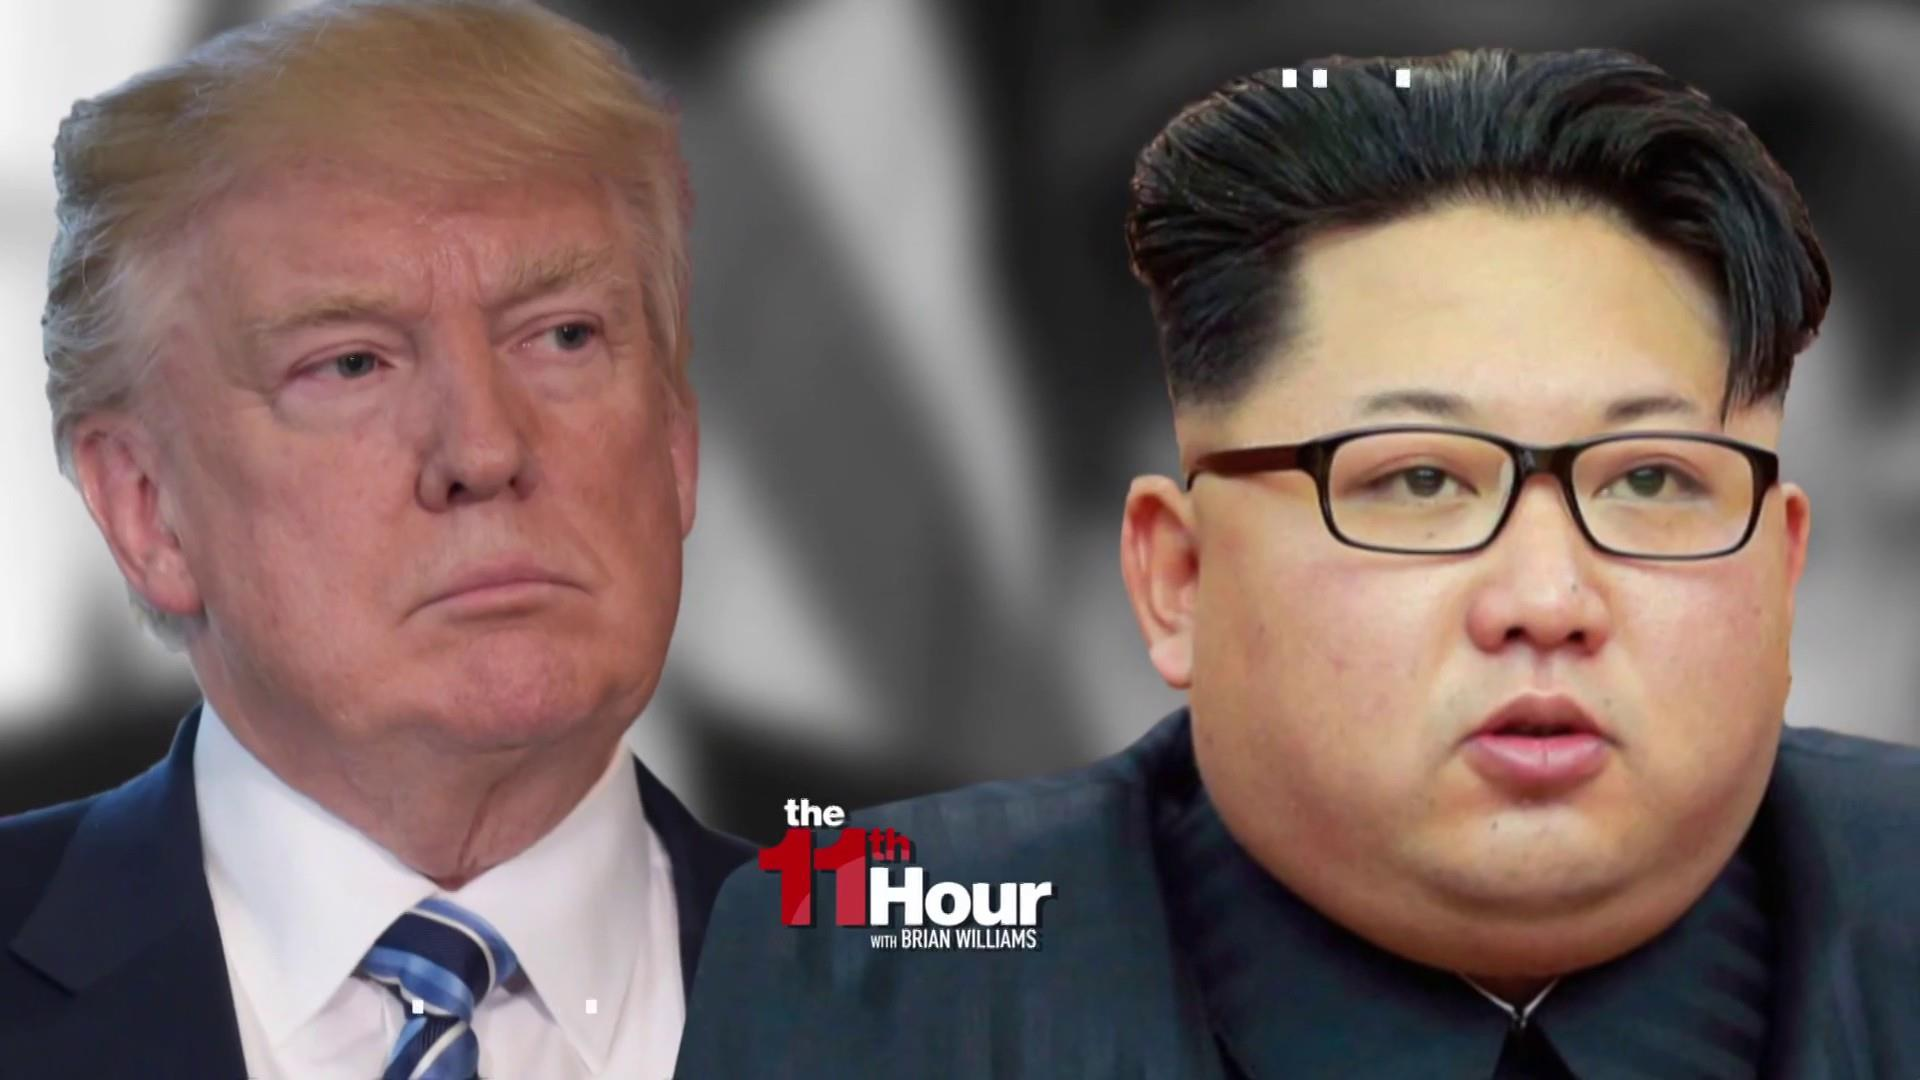 N. Korea threatens to scrap Trump summit over U.S. nuke demands